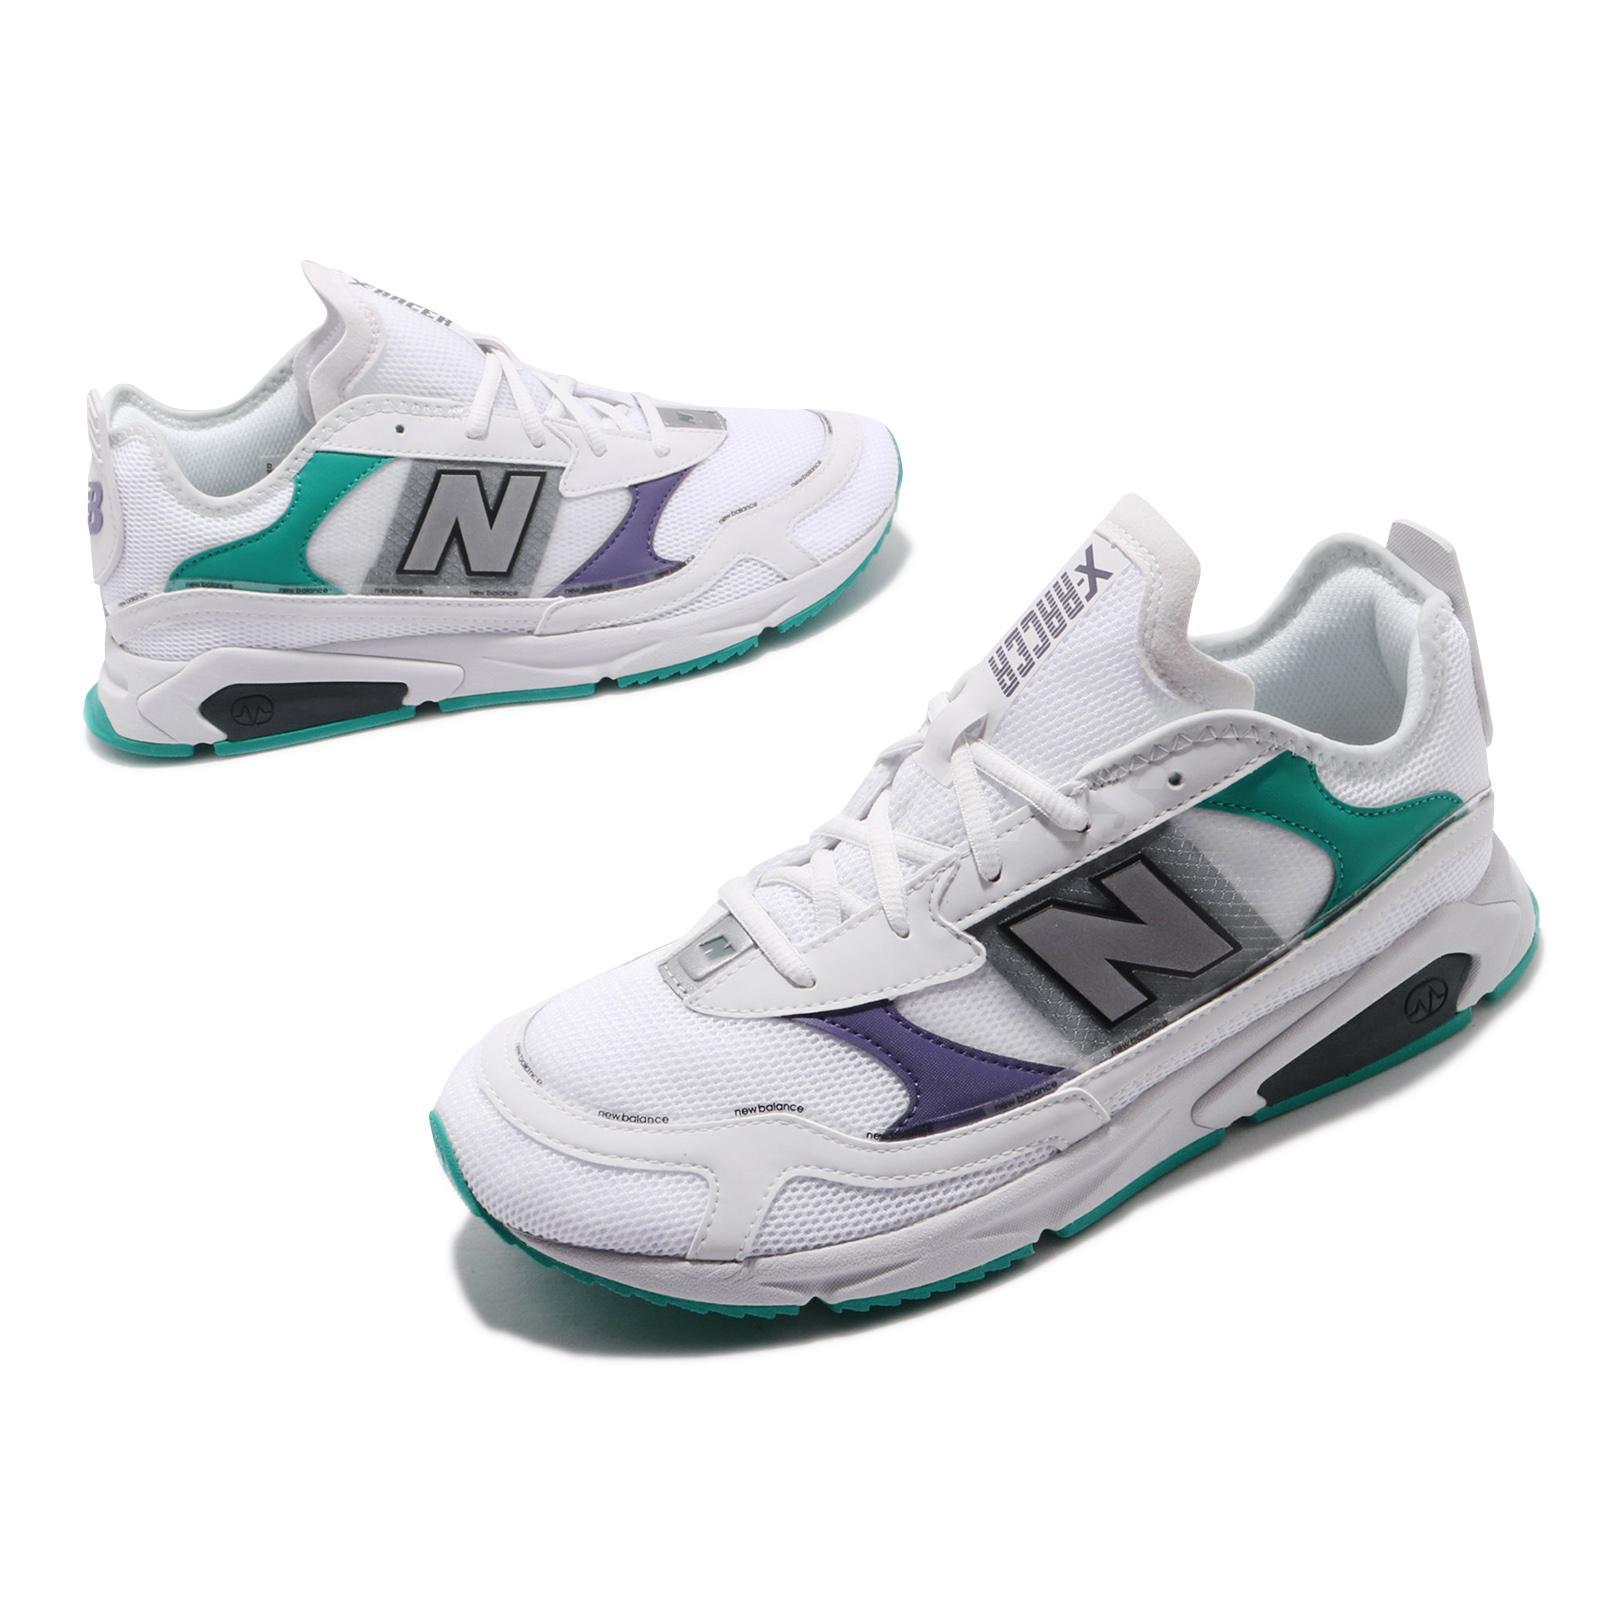 New Balance X-Racer White Silver Green